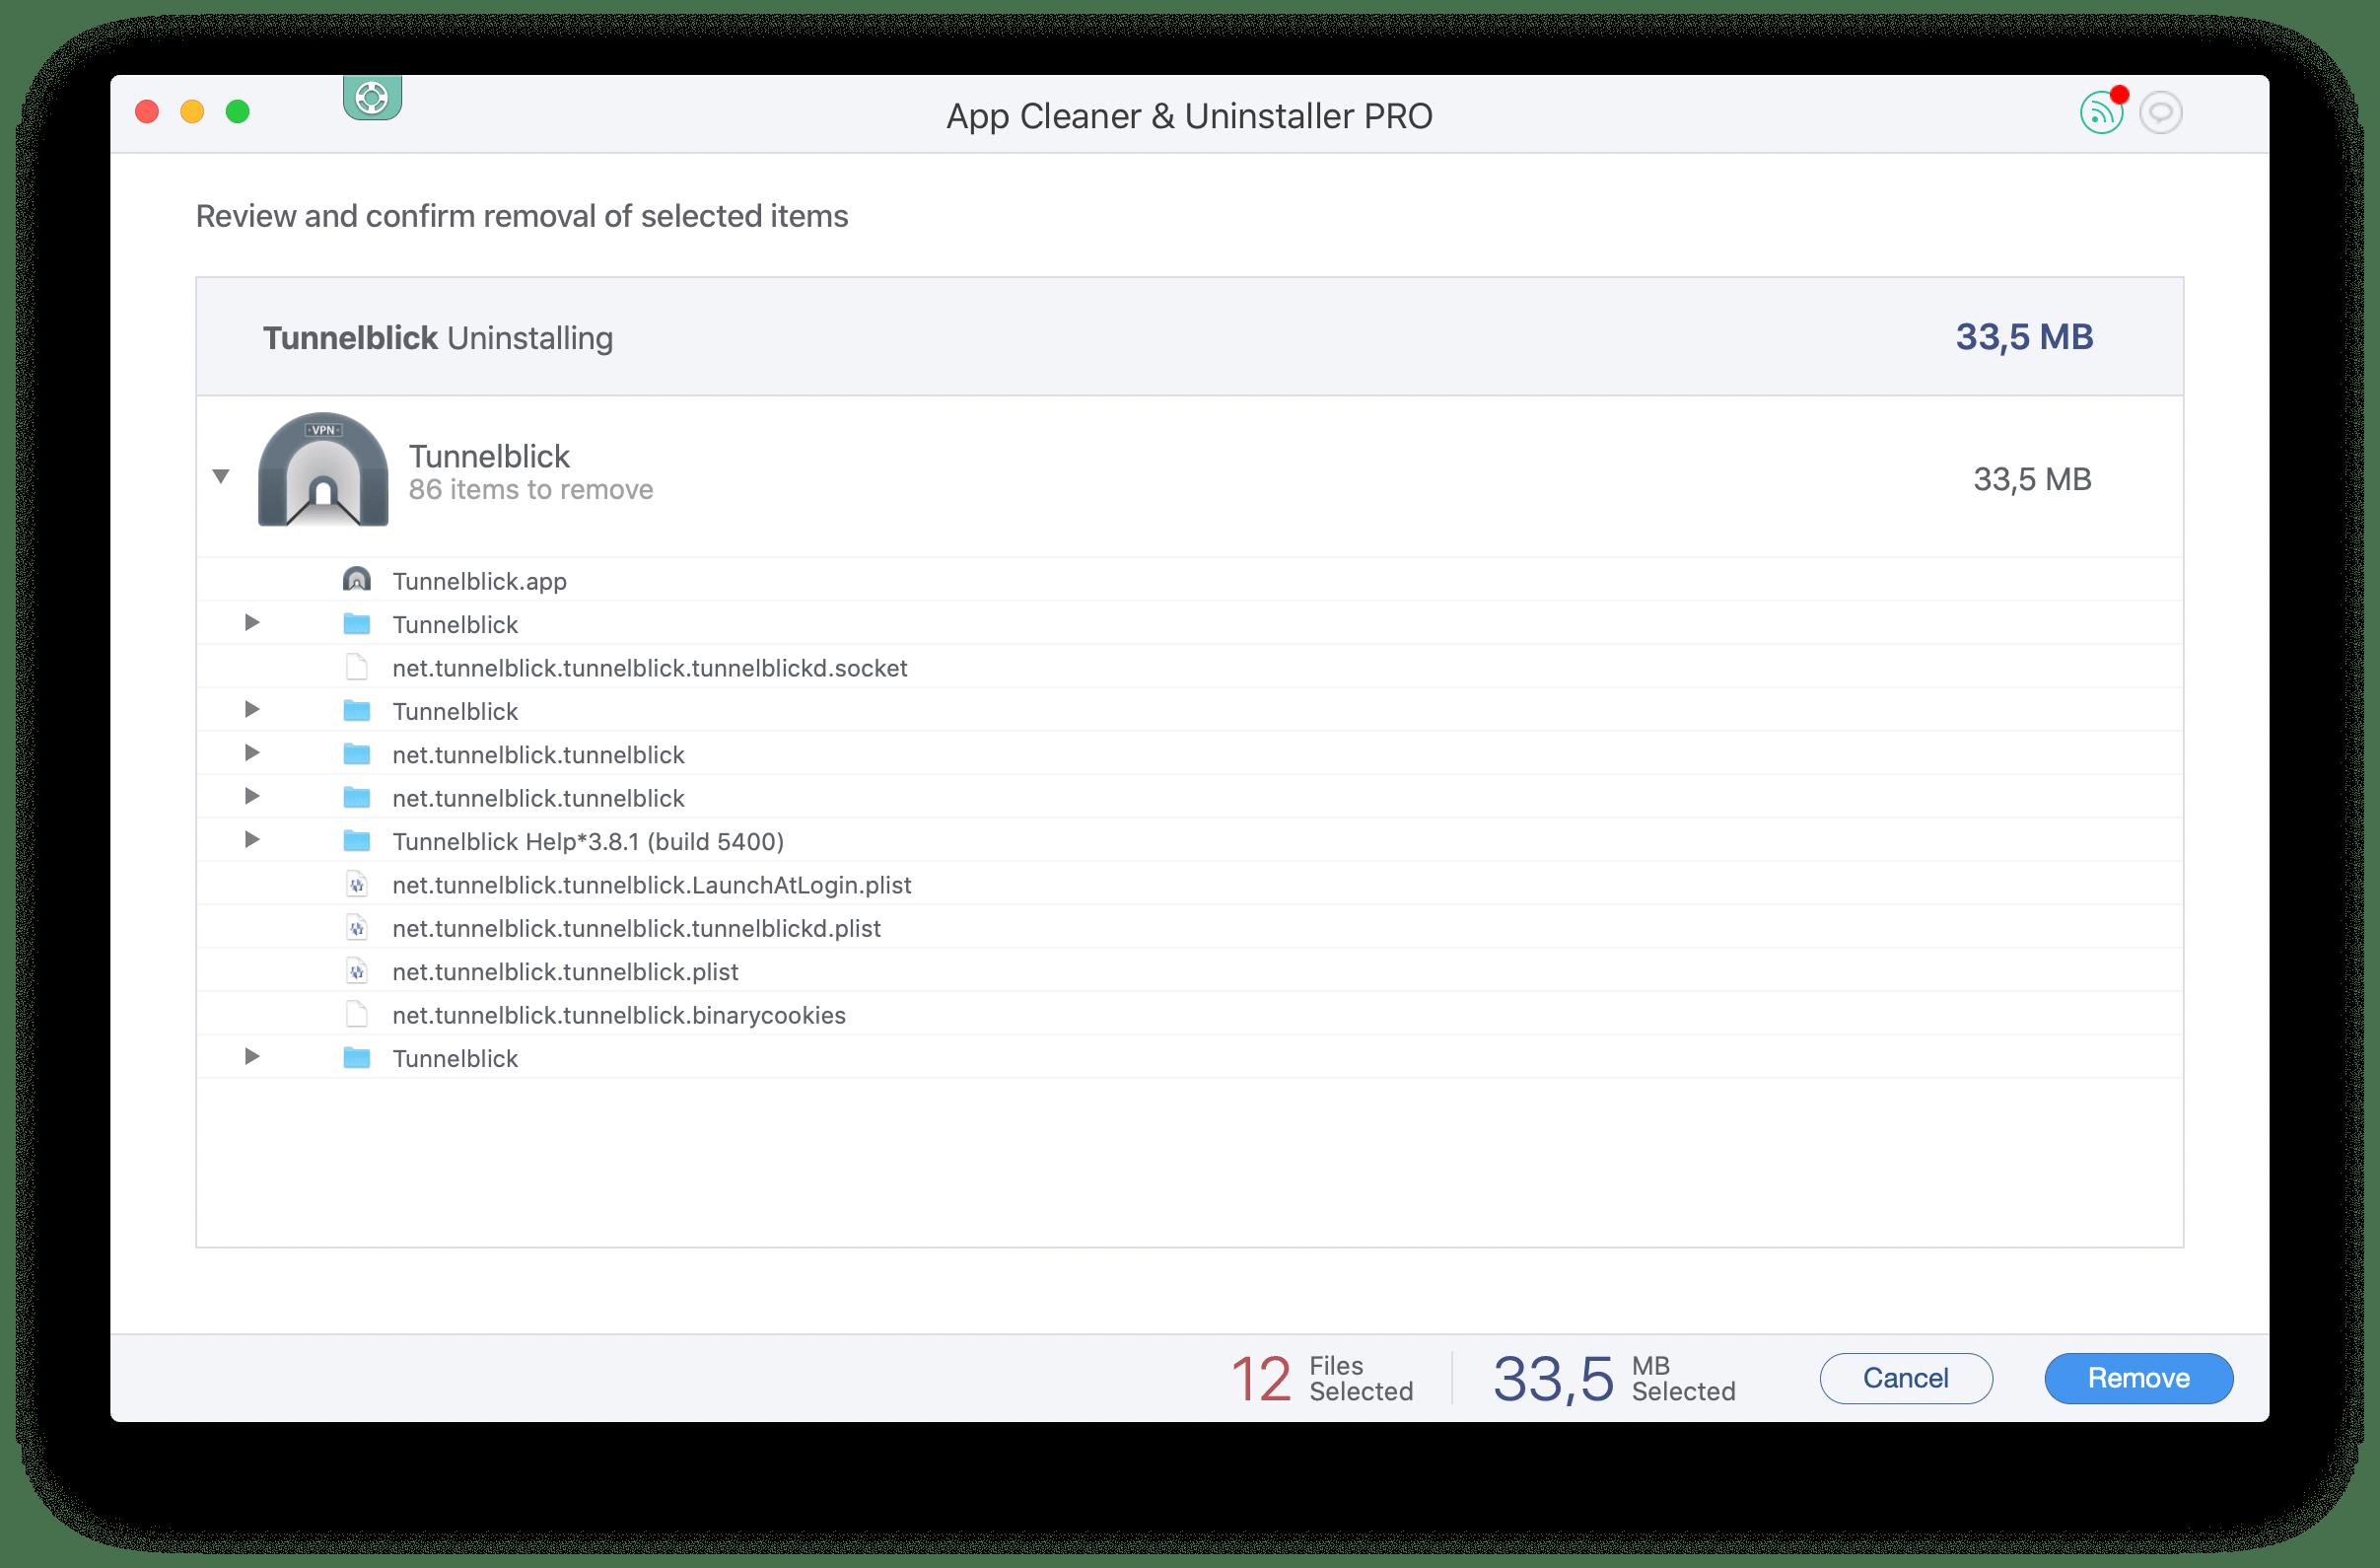 how to uninstall tunnelblick on mac